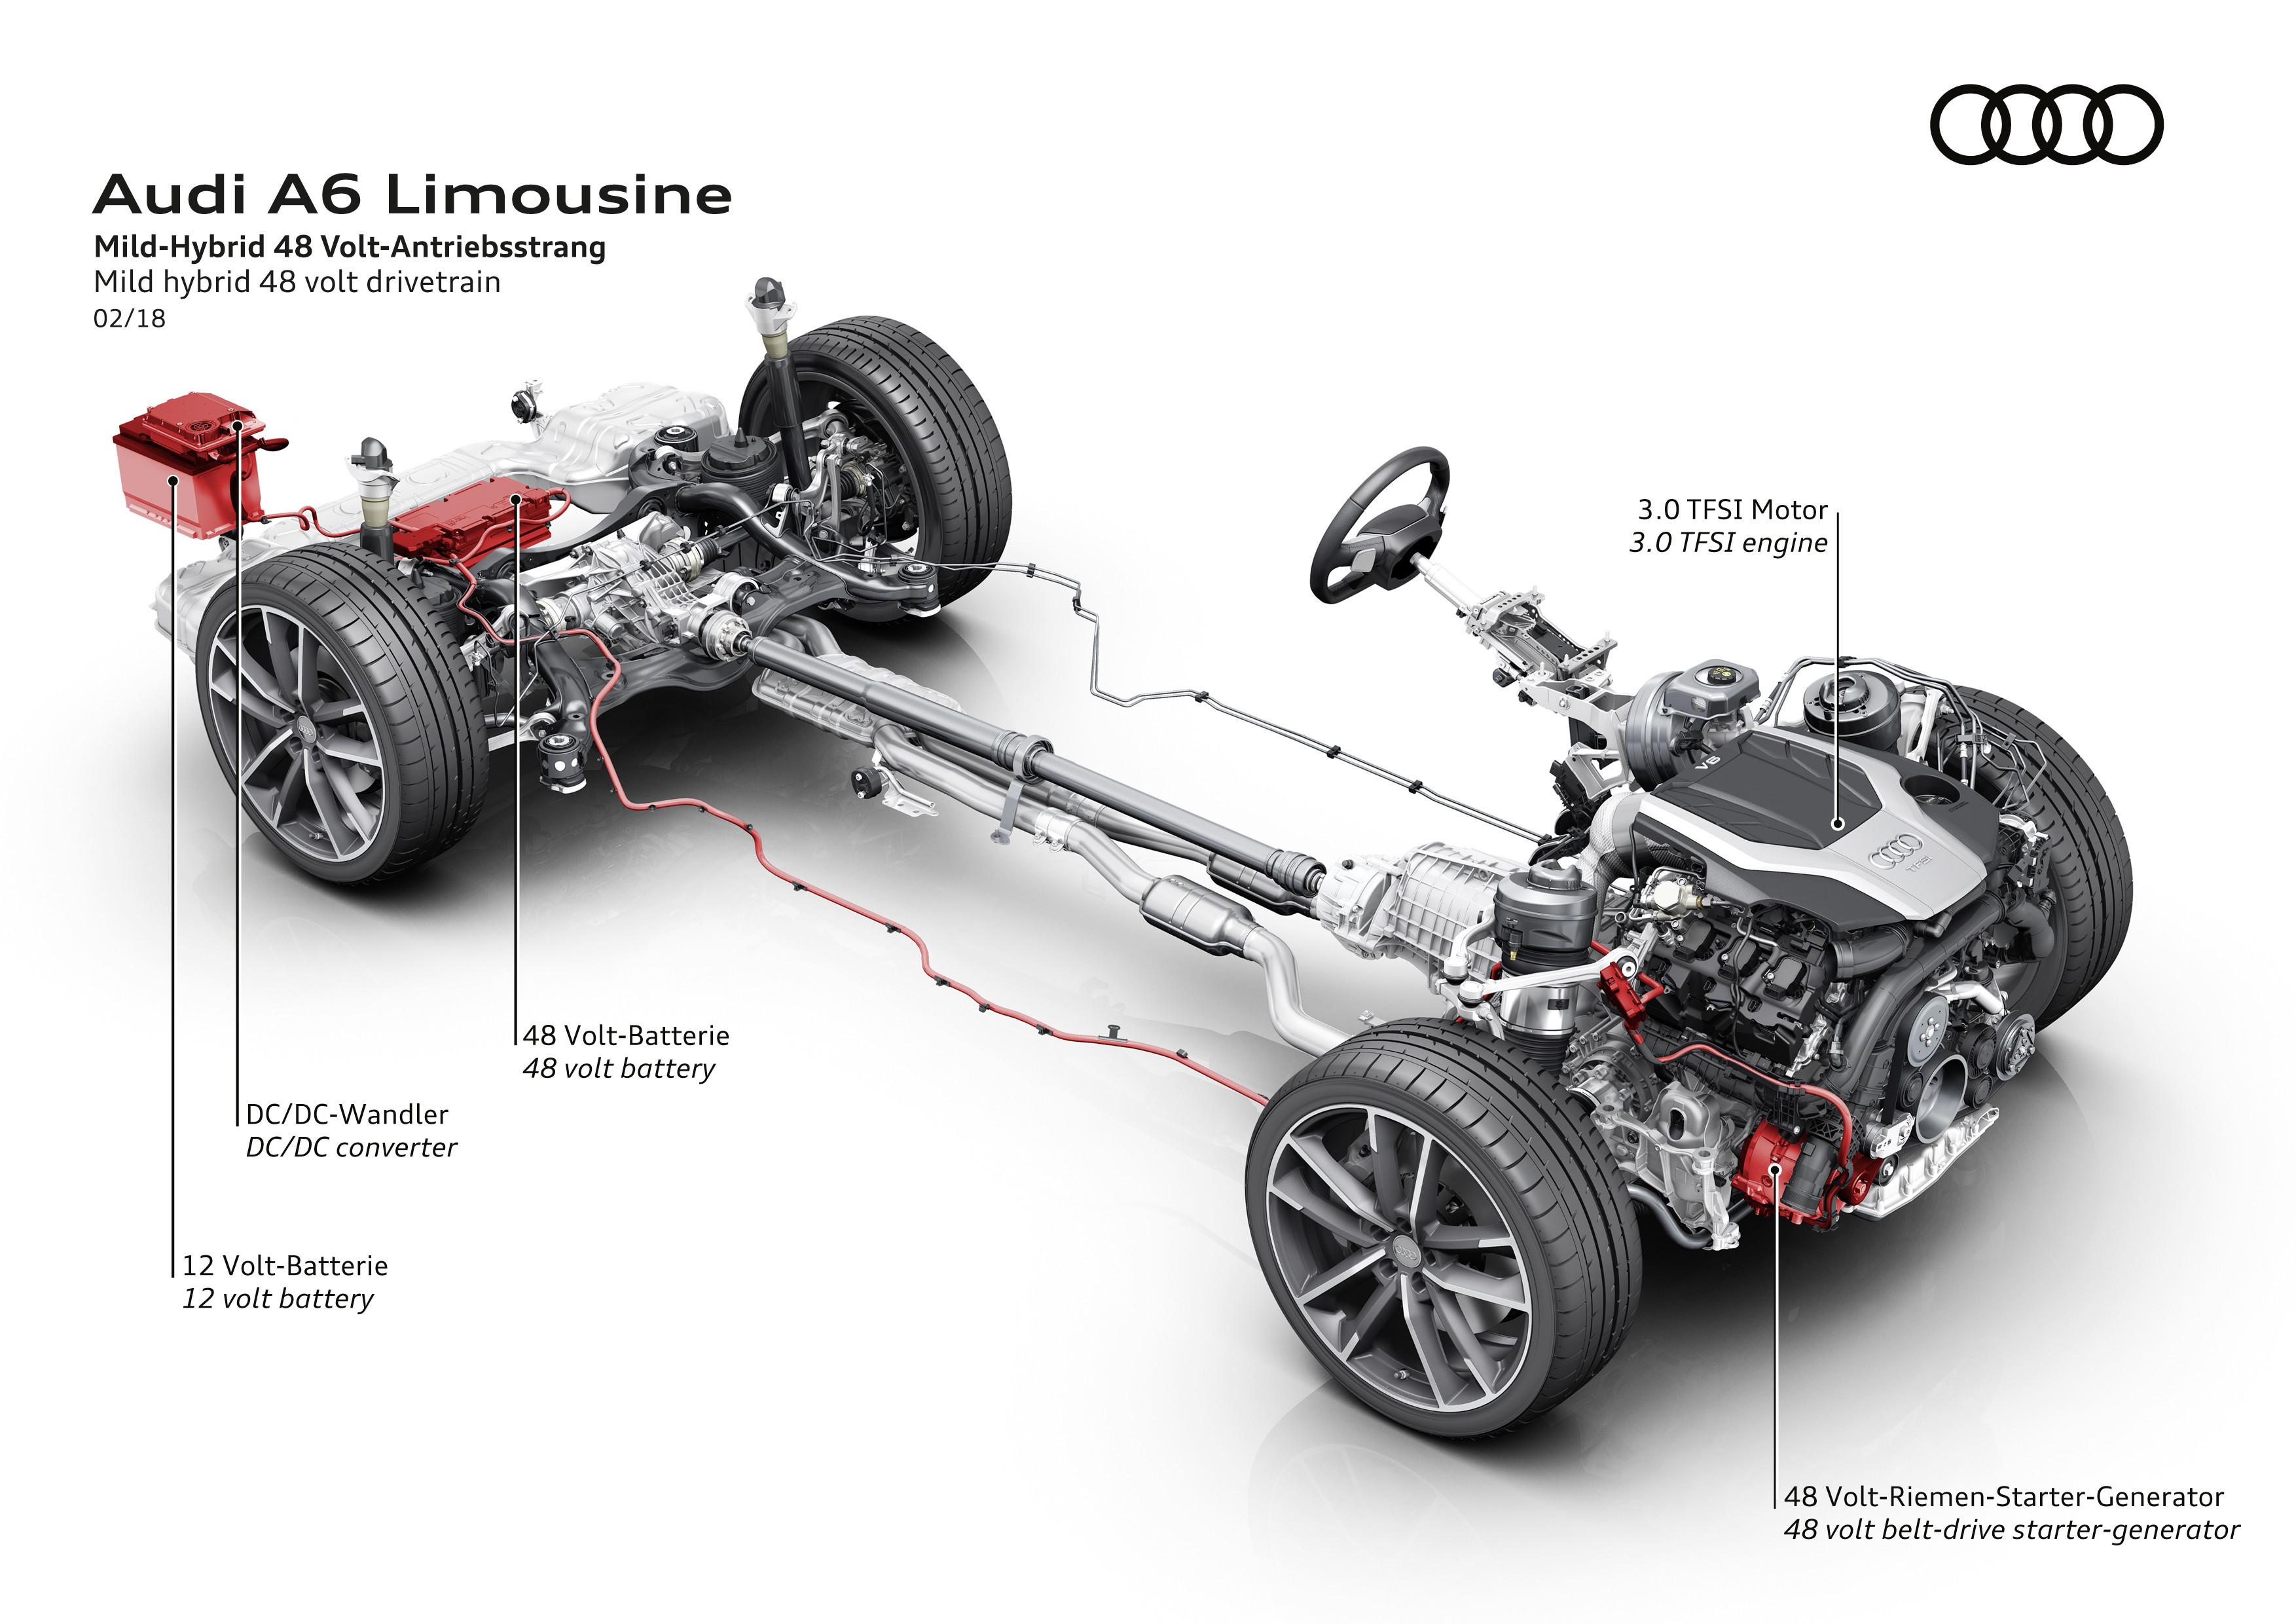 Audi A6 drivetrain